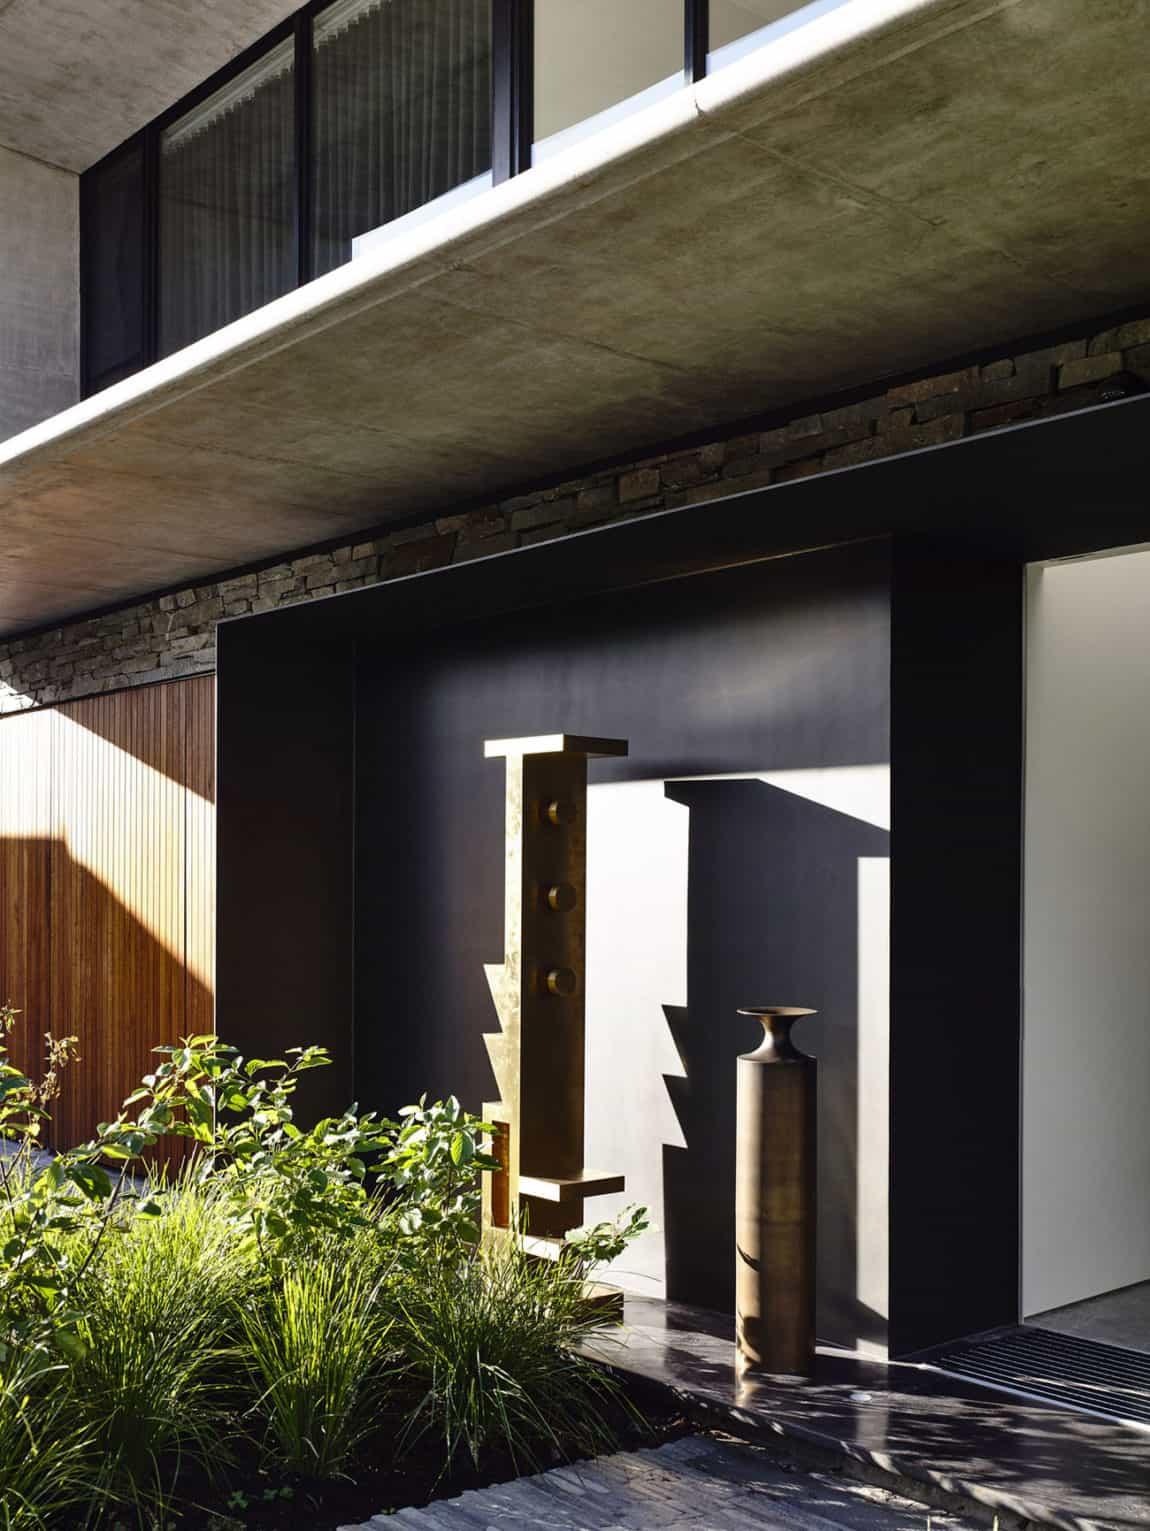 Concrete House by Matt Gibson Architecture (6)